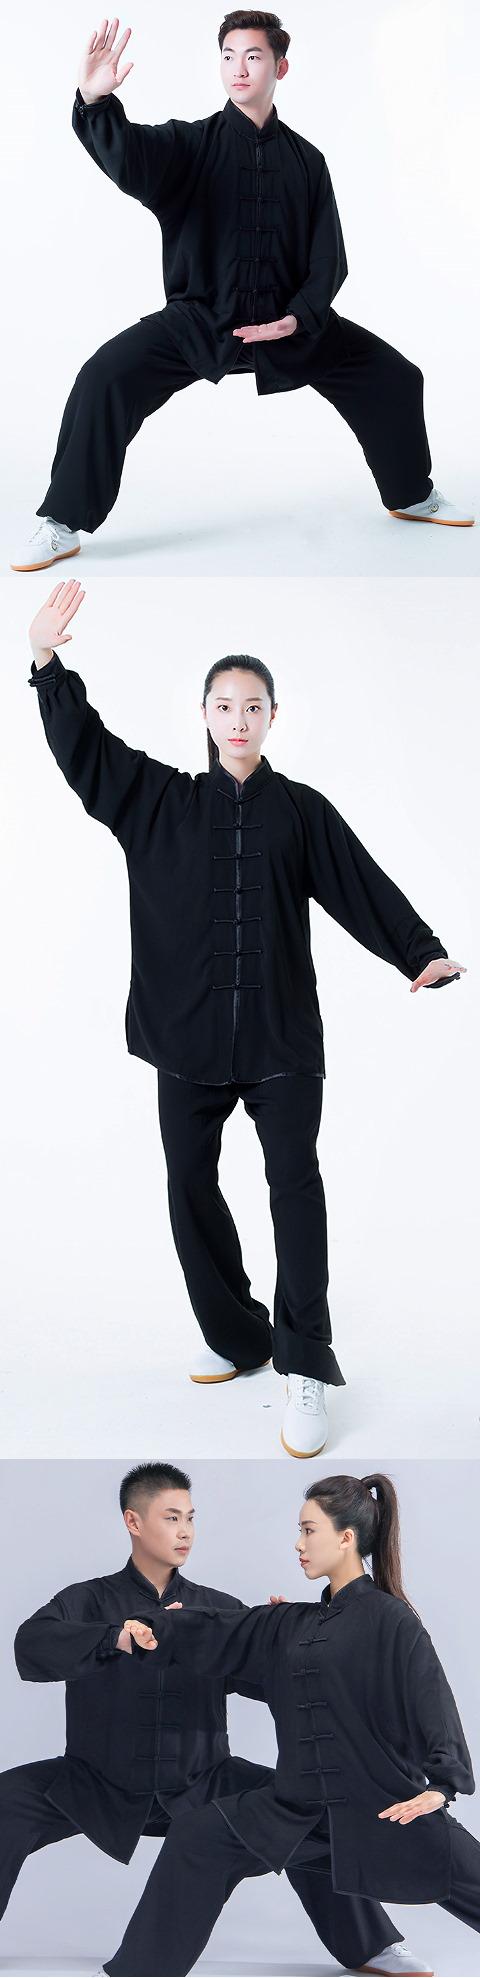 Professional Taichi Kungfu Uniform with Pants - Cotton/Silk - Black (RM)